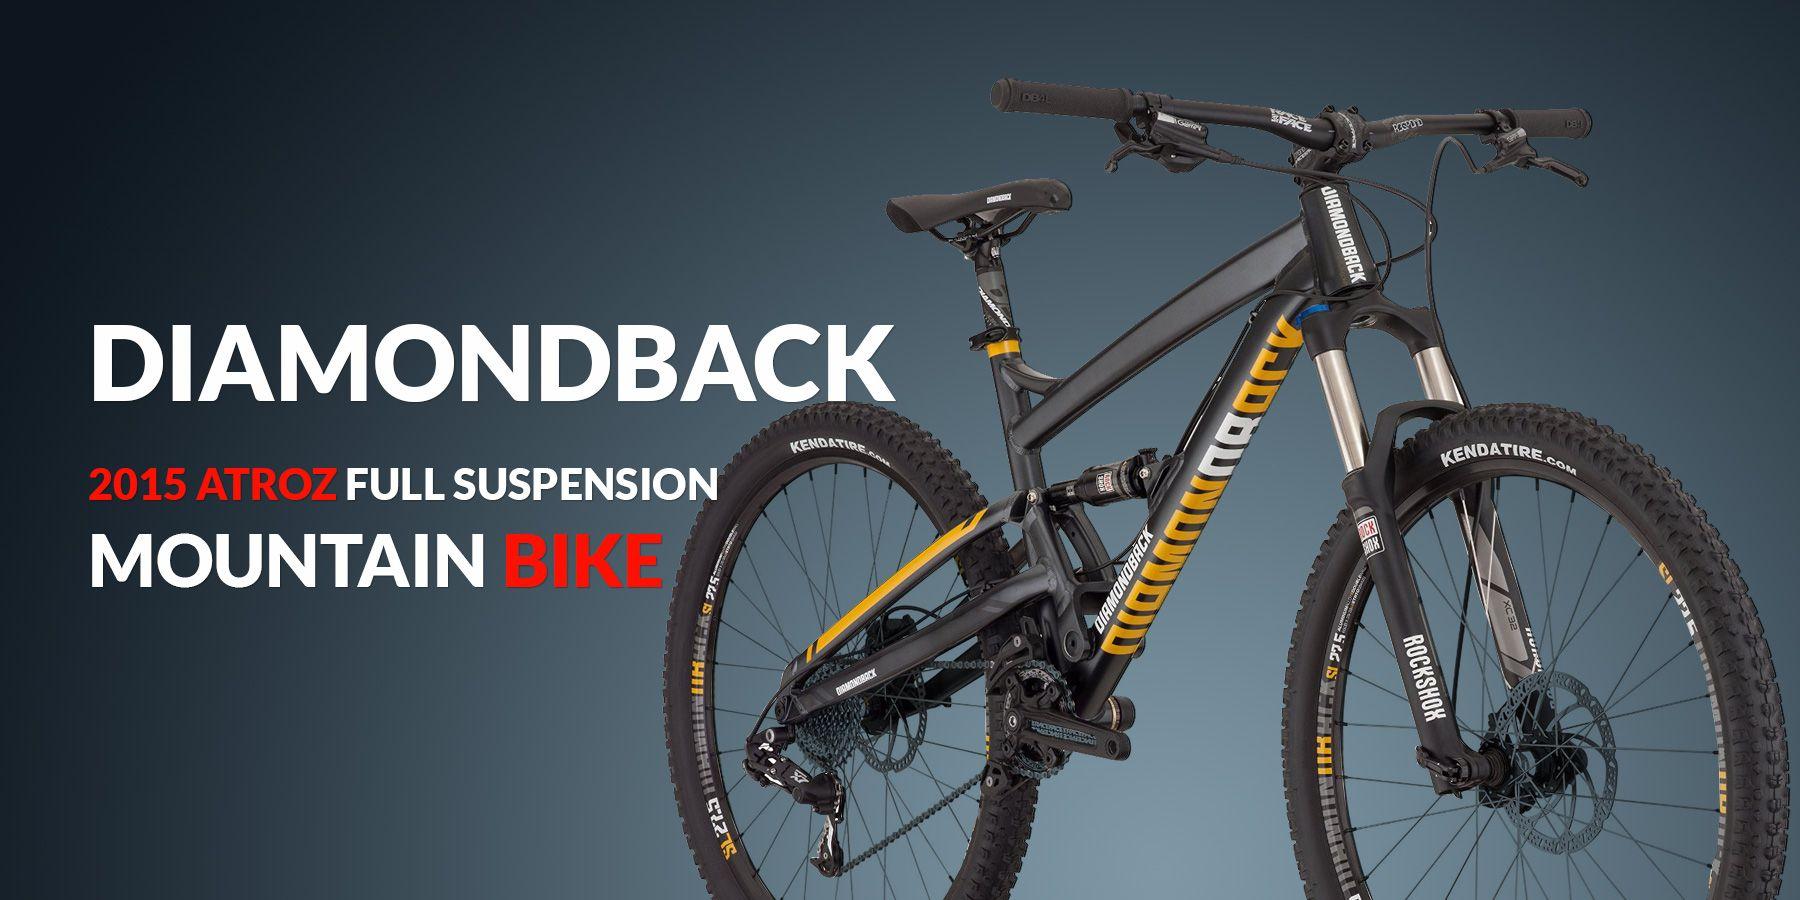 Diamondback Bicycles 2015 Atroz Full Suspension Mountain